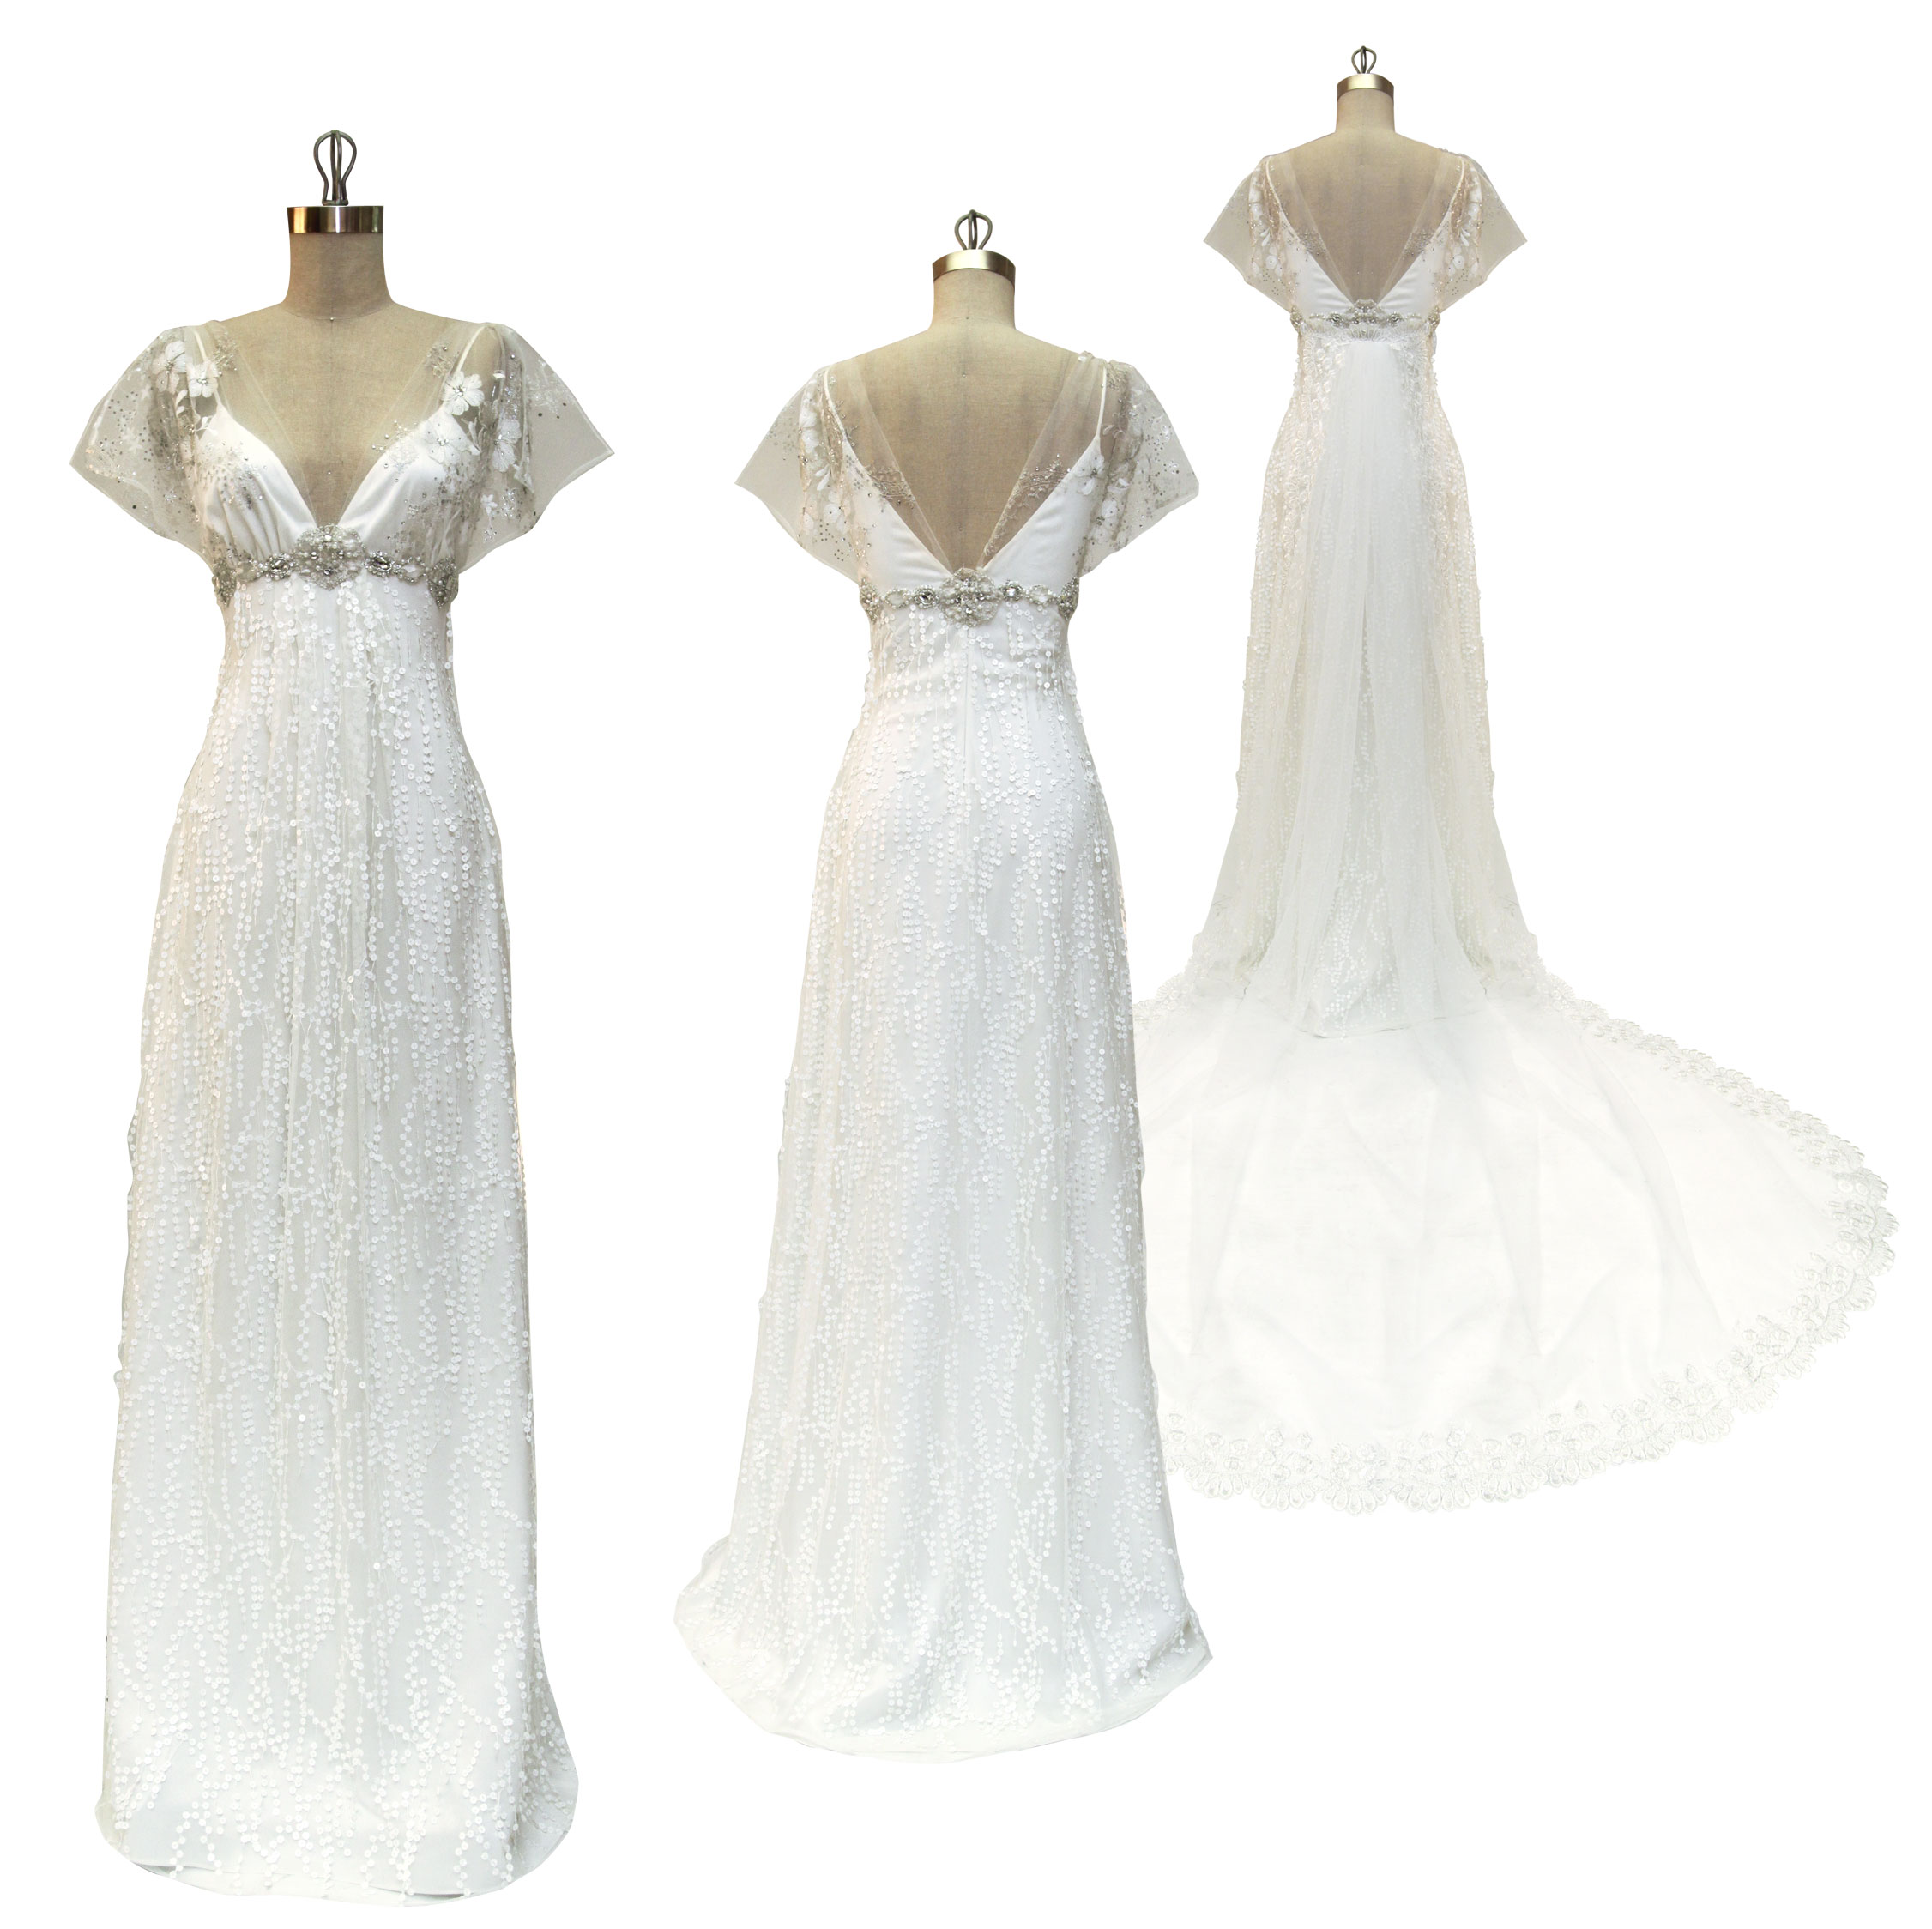 White v neck empire wedding dress with beaded sash below